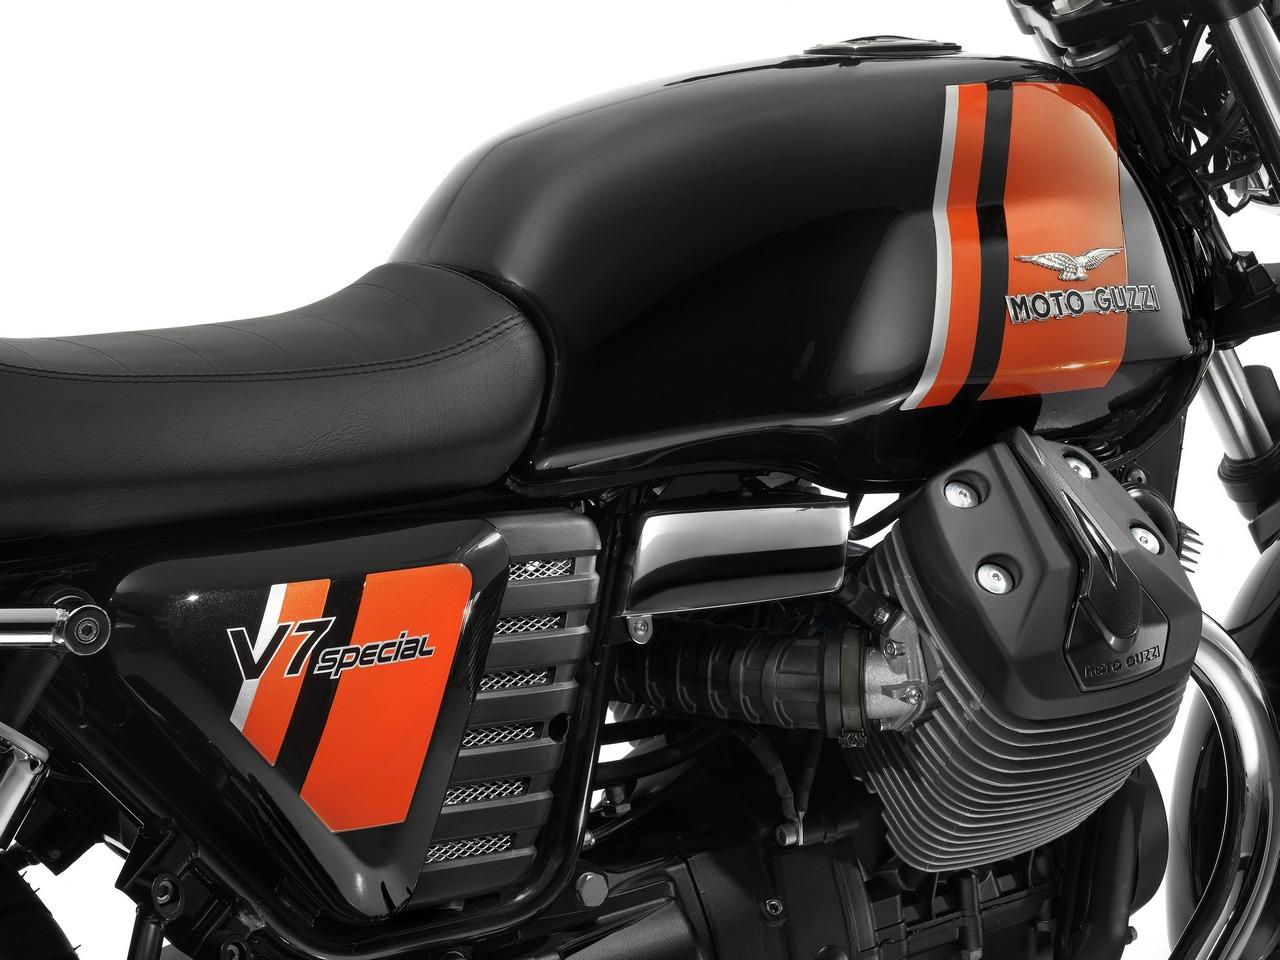 Moto Guzzi V7 Special - EICMA 2012